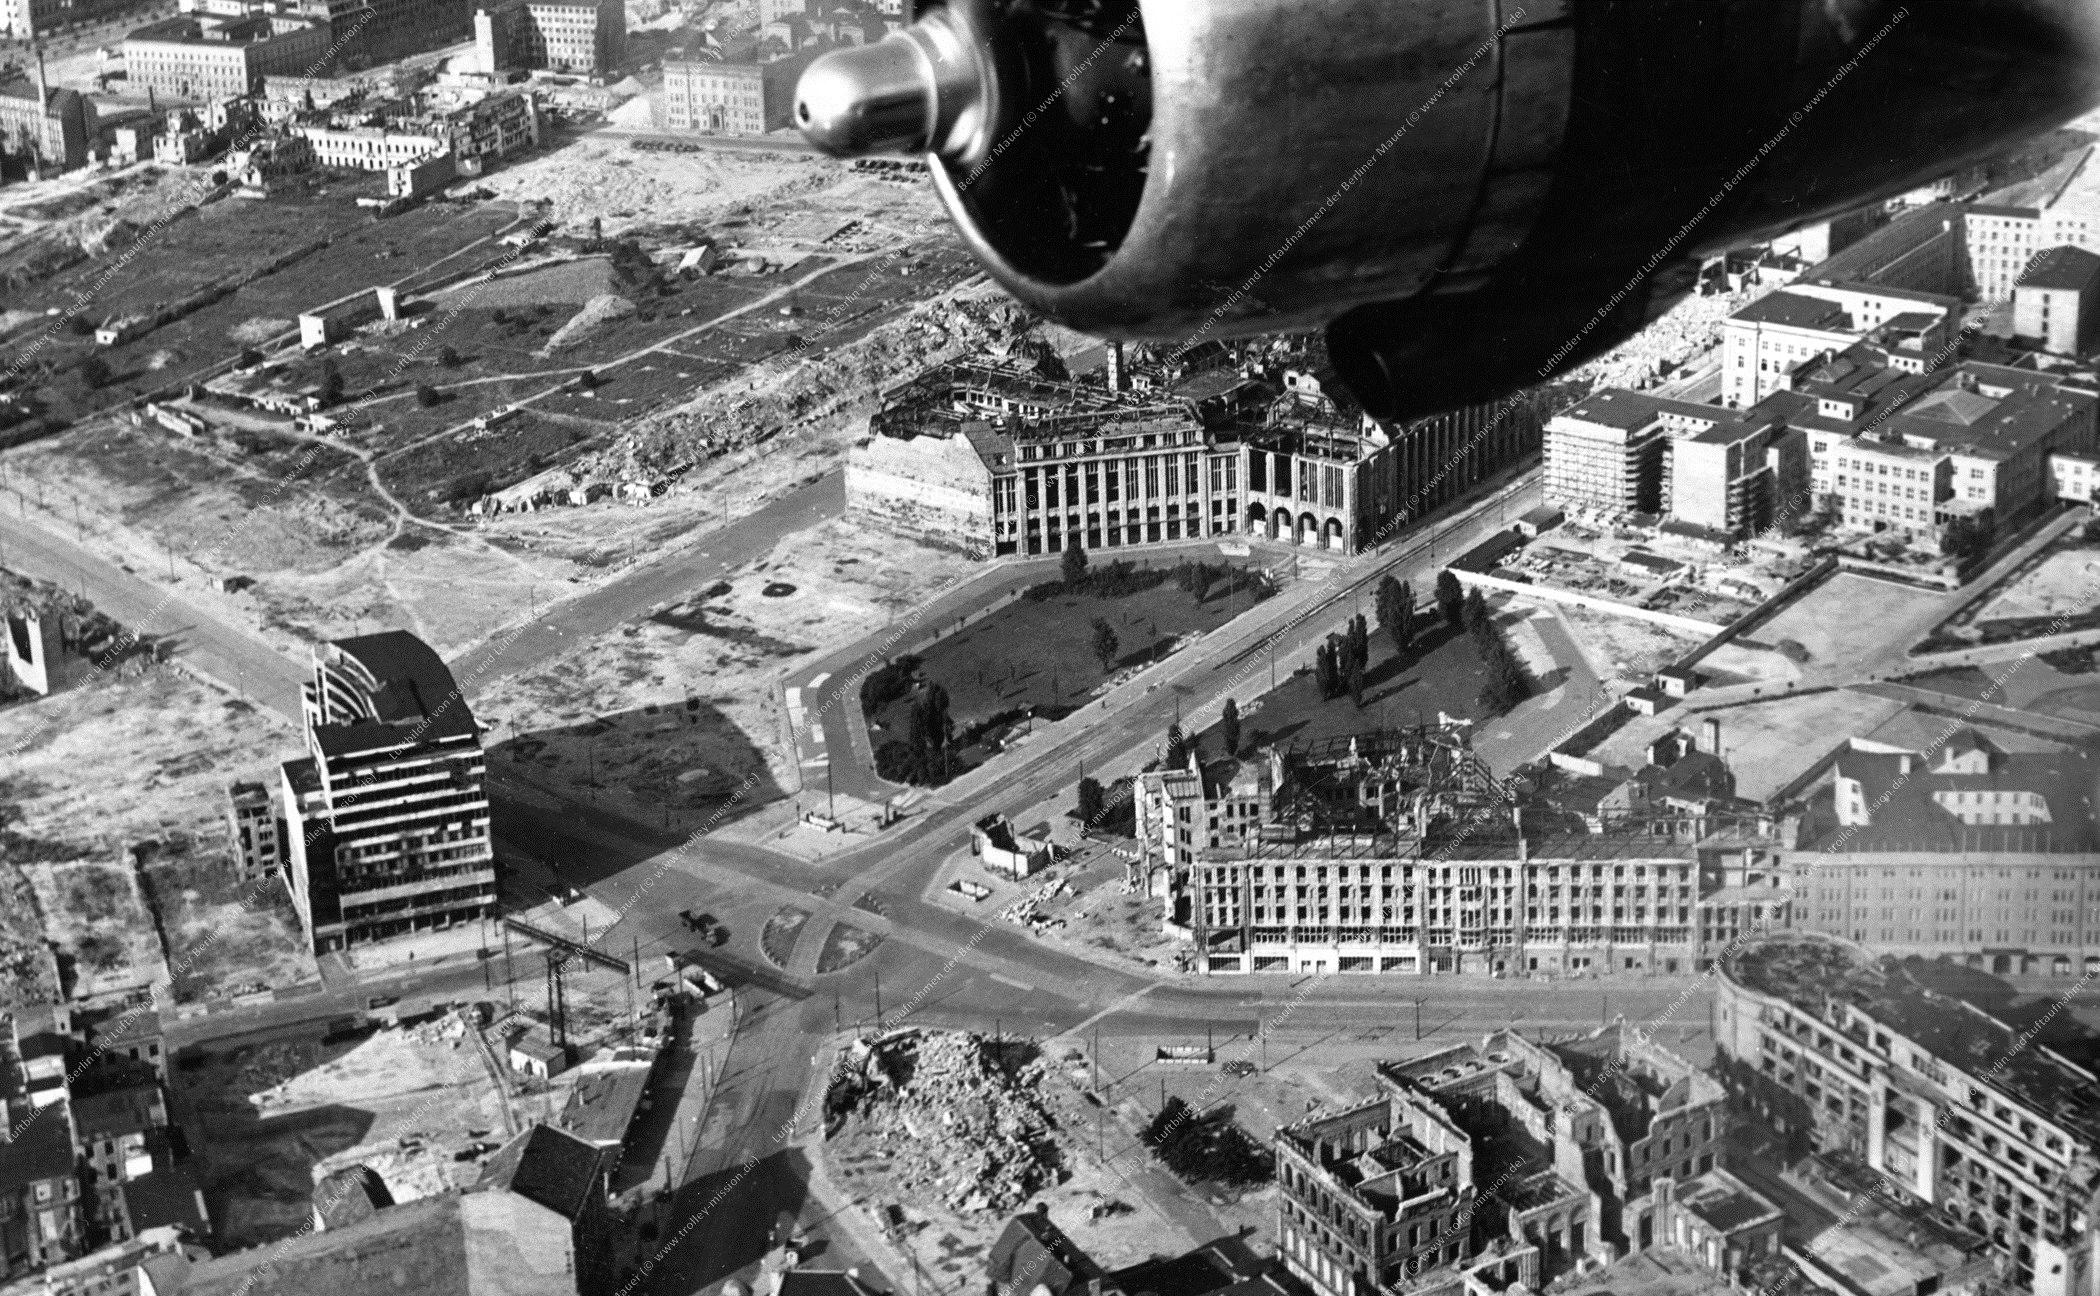 Berlin Luftbild Potsdamer Platz vom 10. April 1959 (Bild 003)